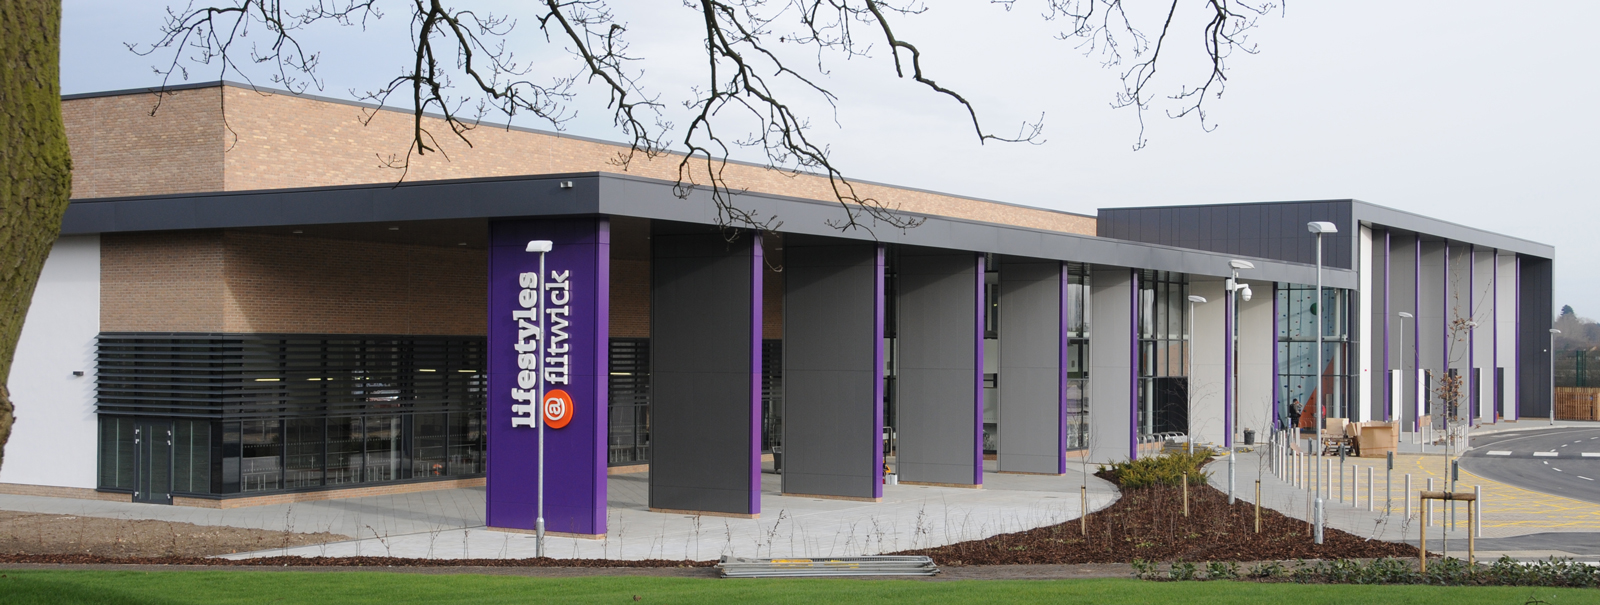 Flitwick Leisure Centre